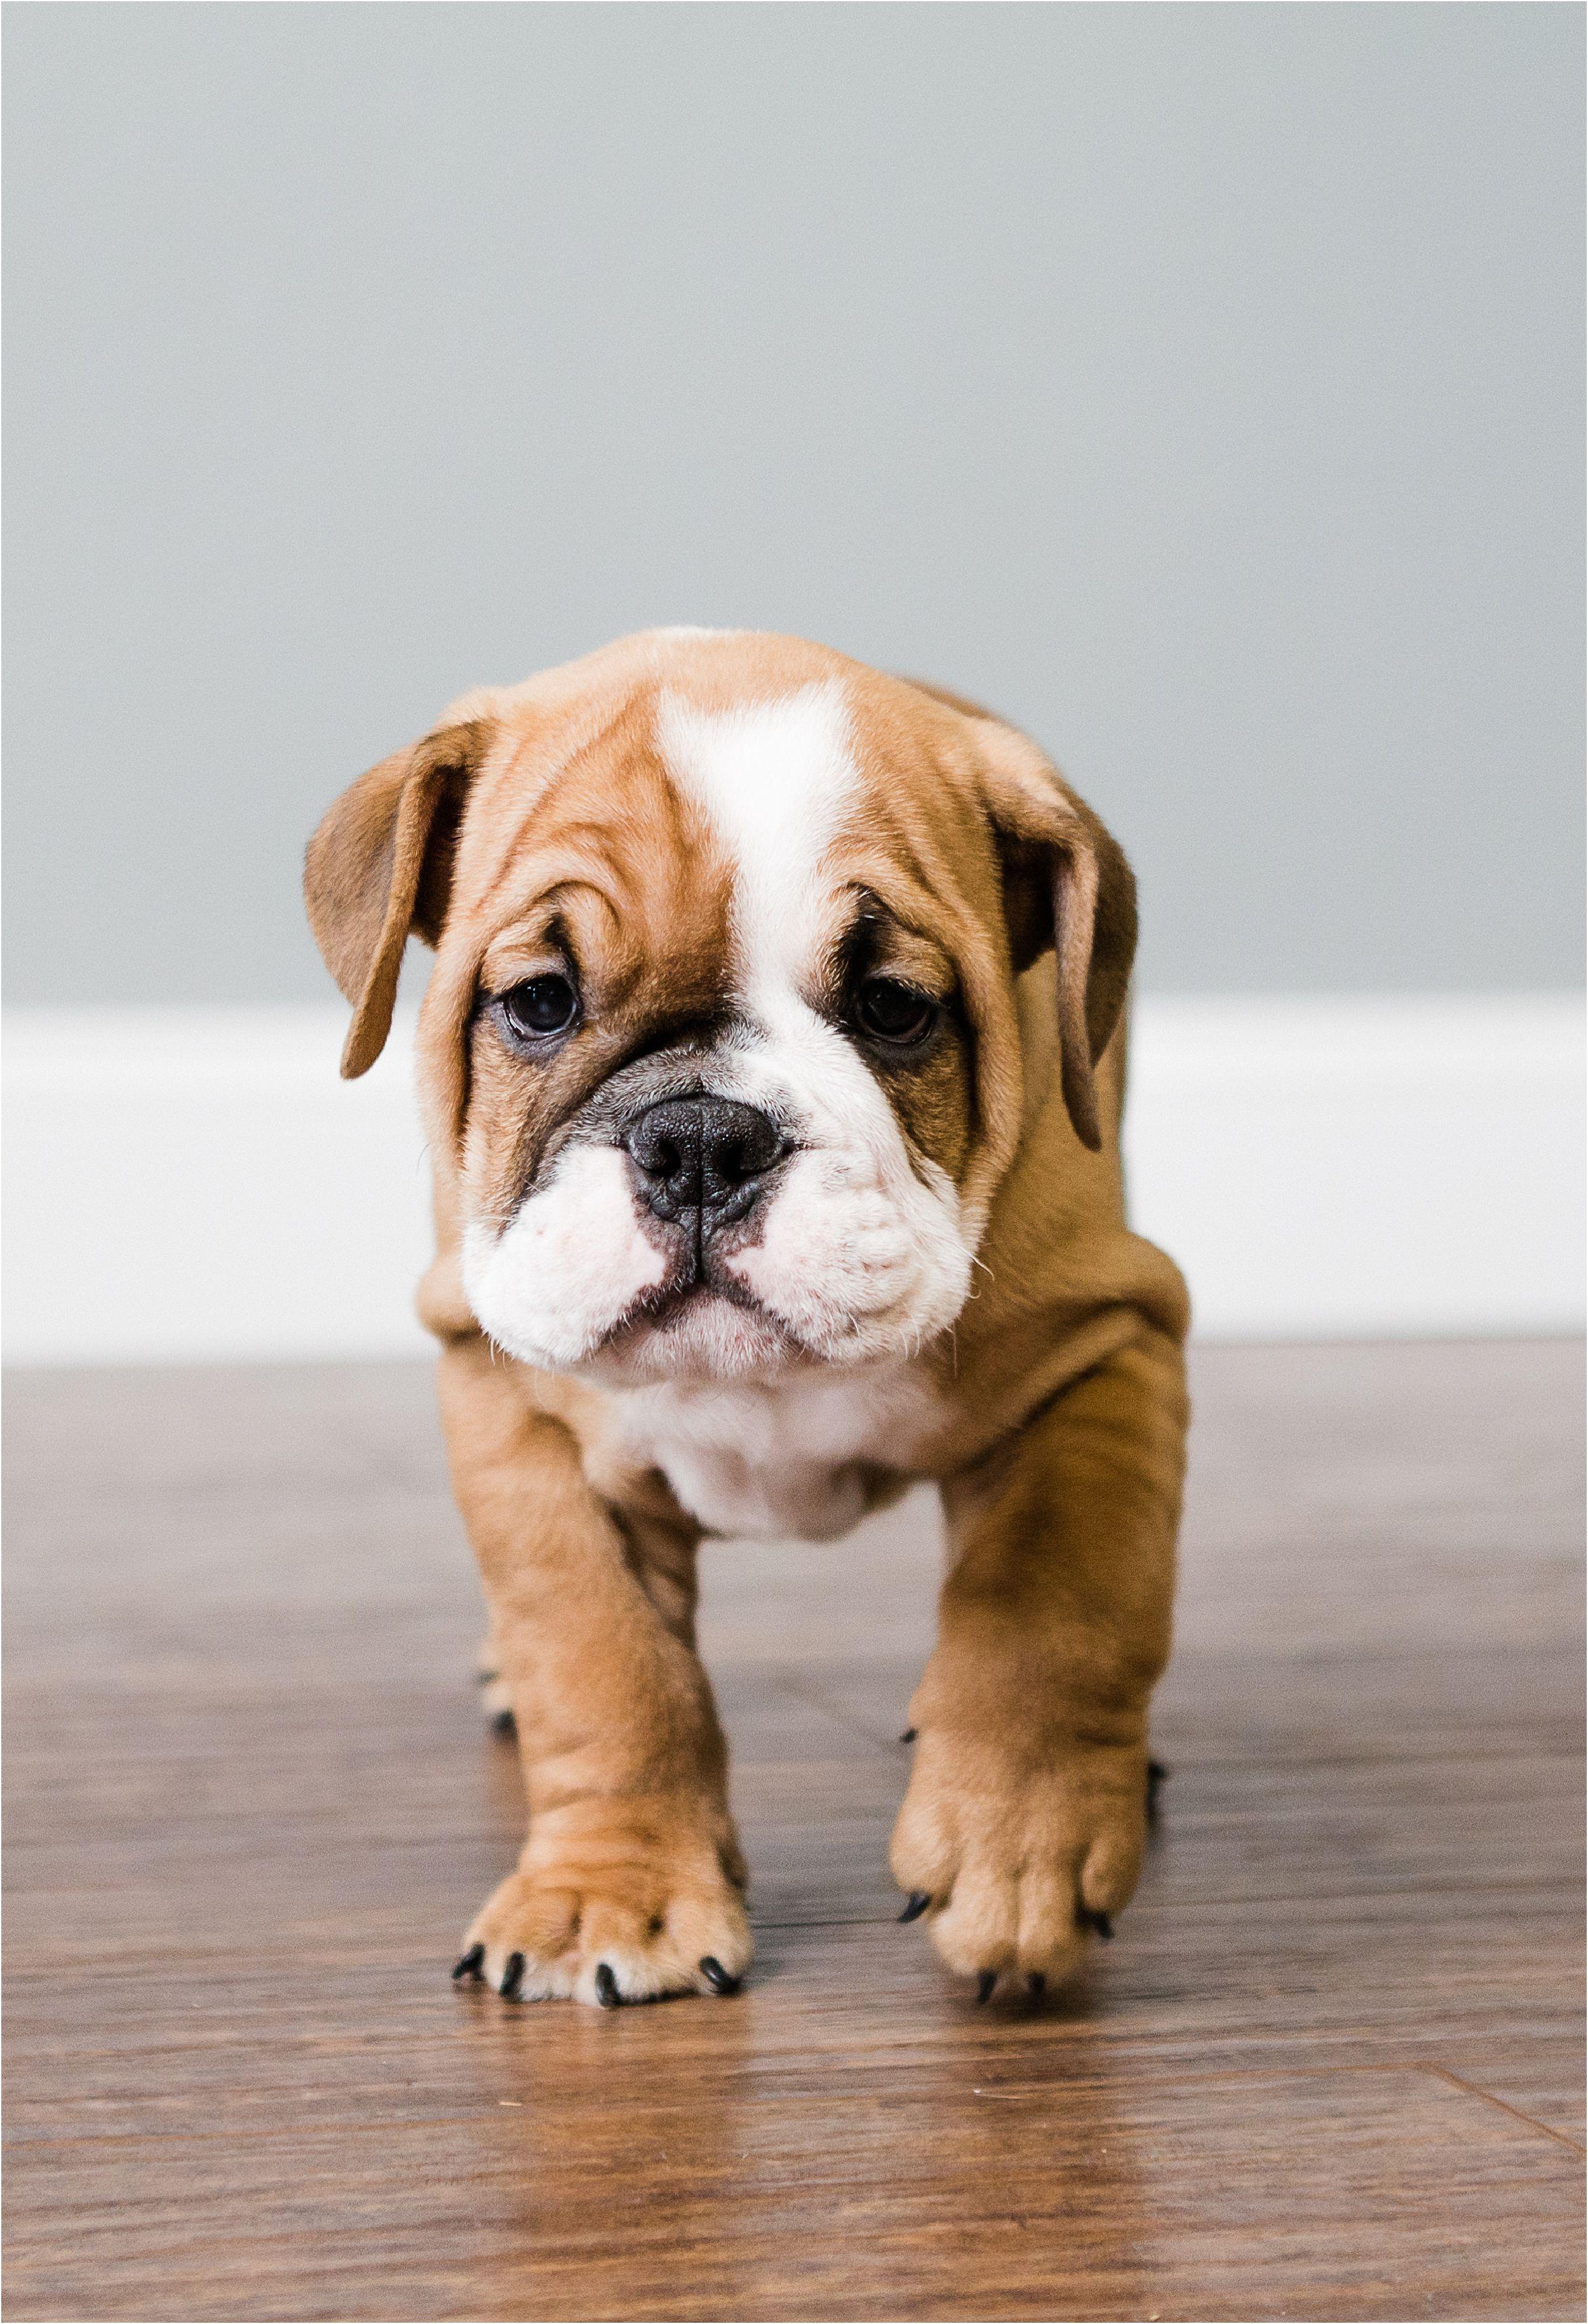 Petsochic Customized Dog Collars And Leashes Petsocchic Com